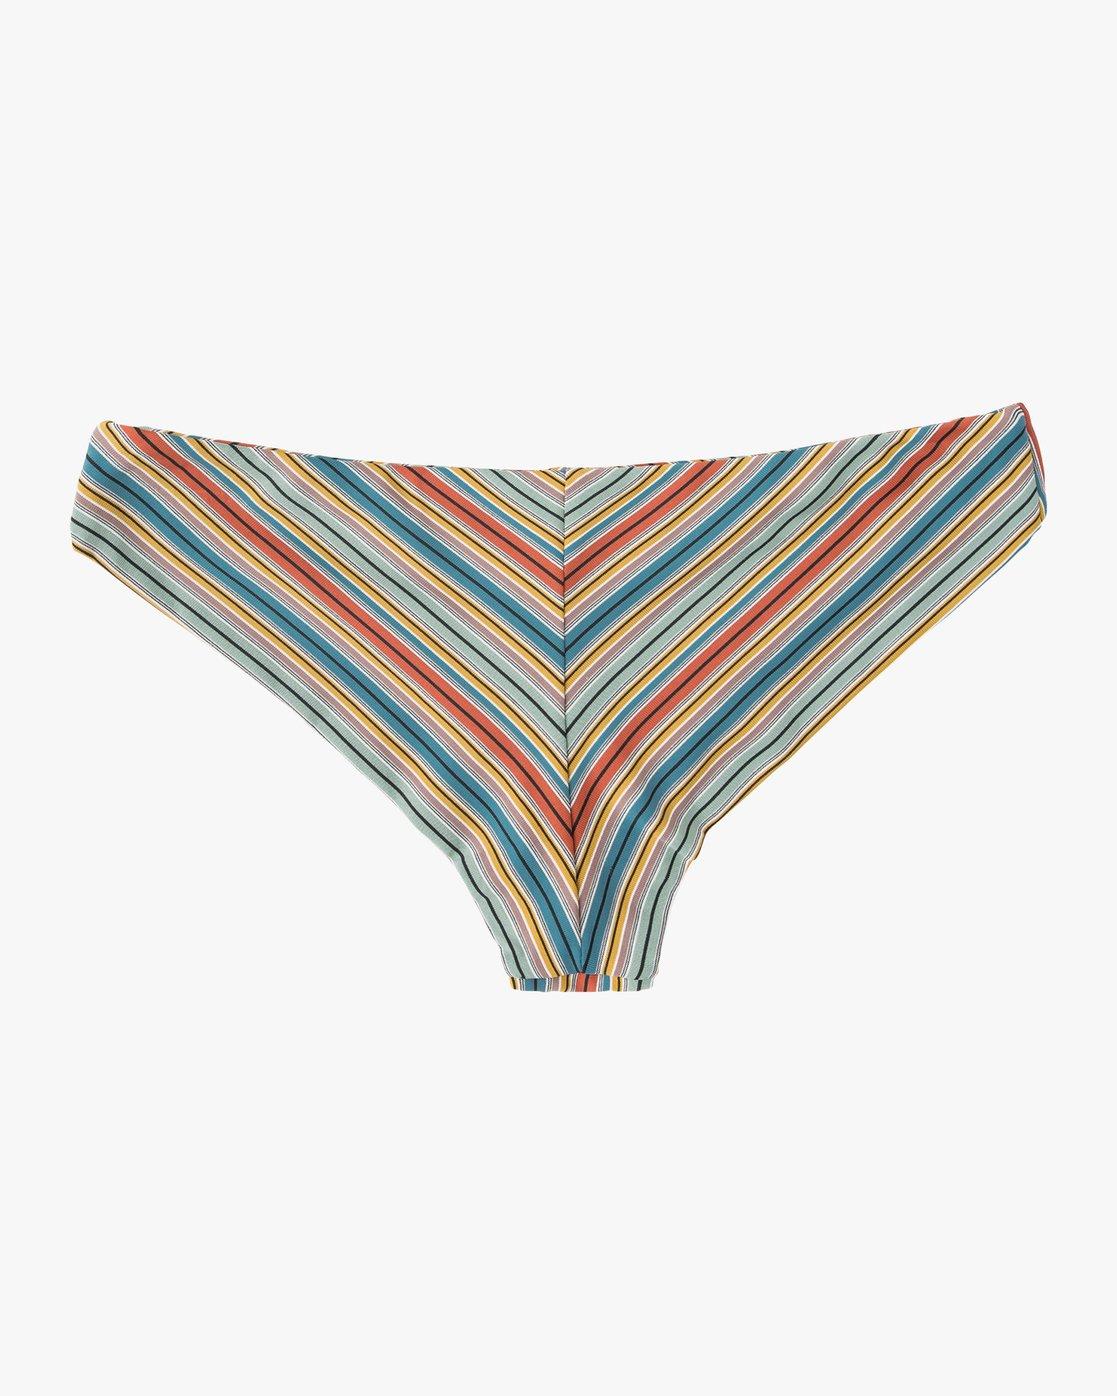 5 Sixteenth St Striped Cheeky Bikini Bottoms Multicolor XB06NRSC RVCA